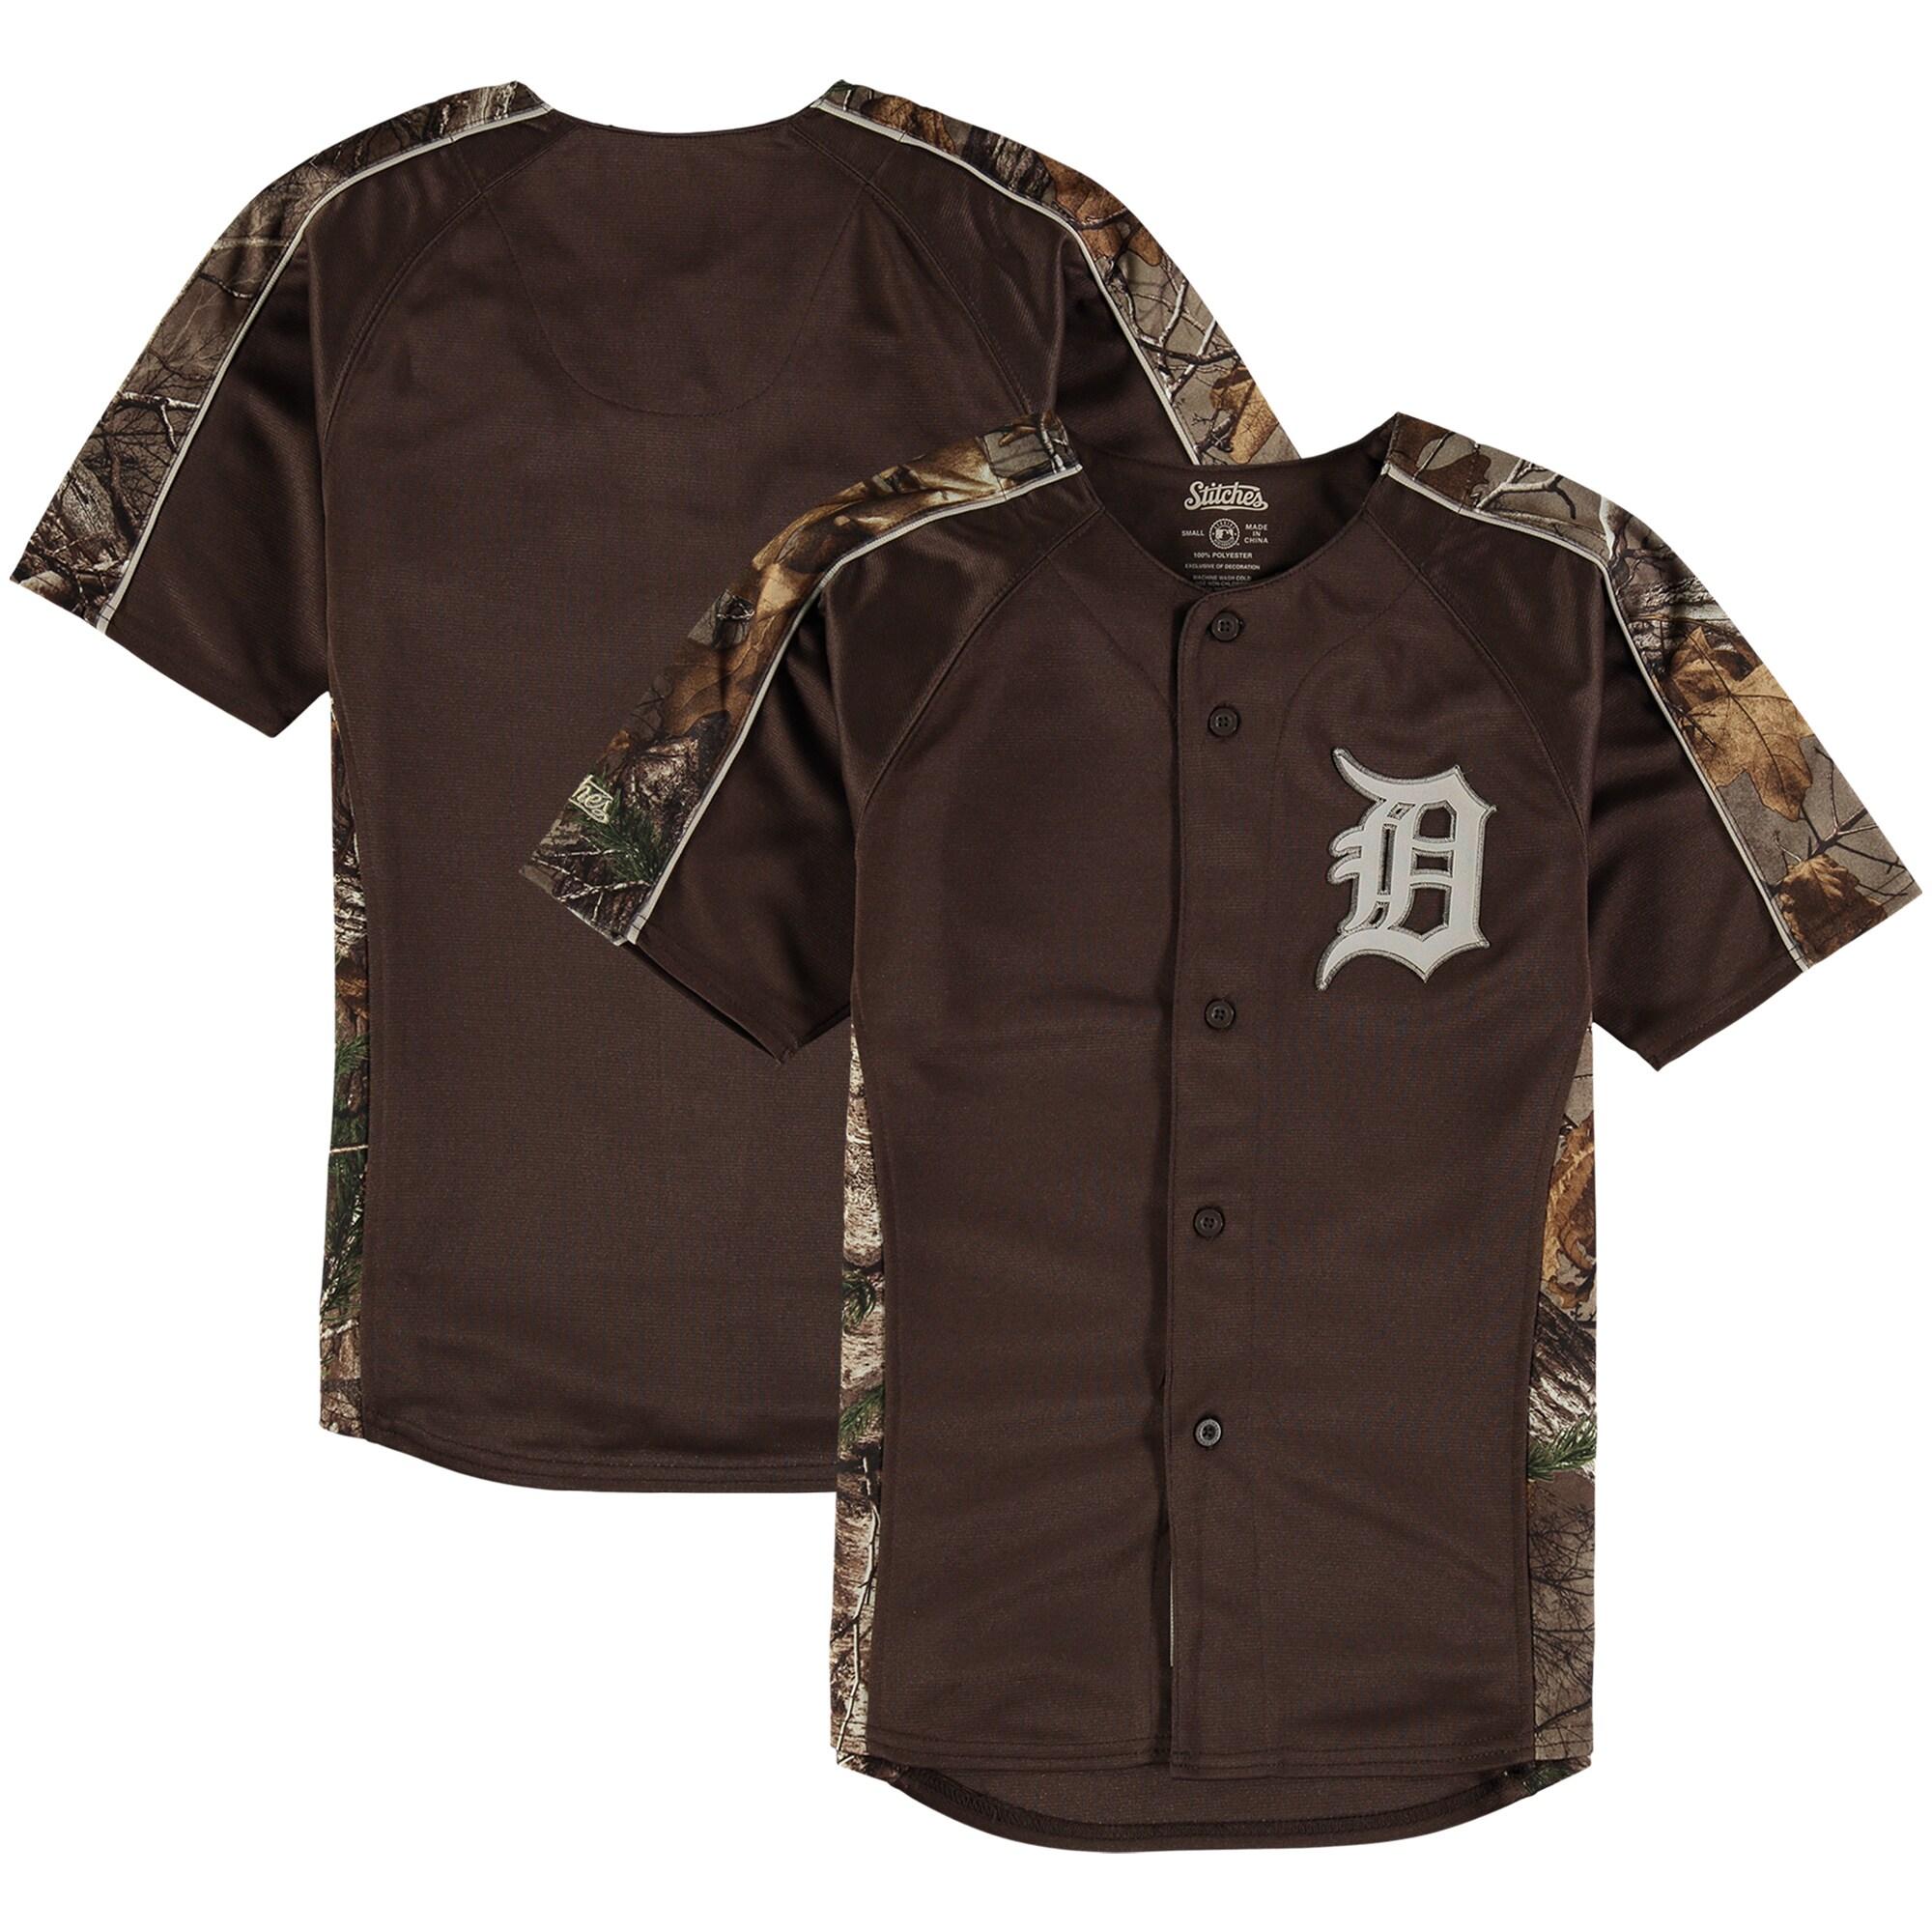 Detroit Tigers Stitches Youth Replica Jersey - Realtree Camo